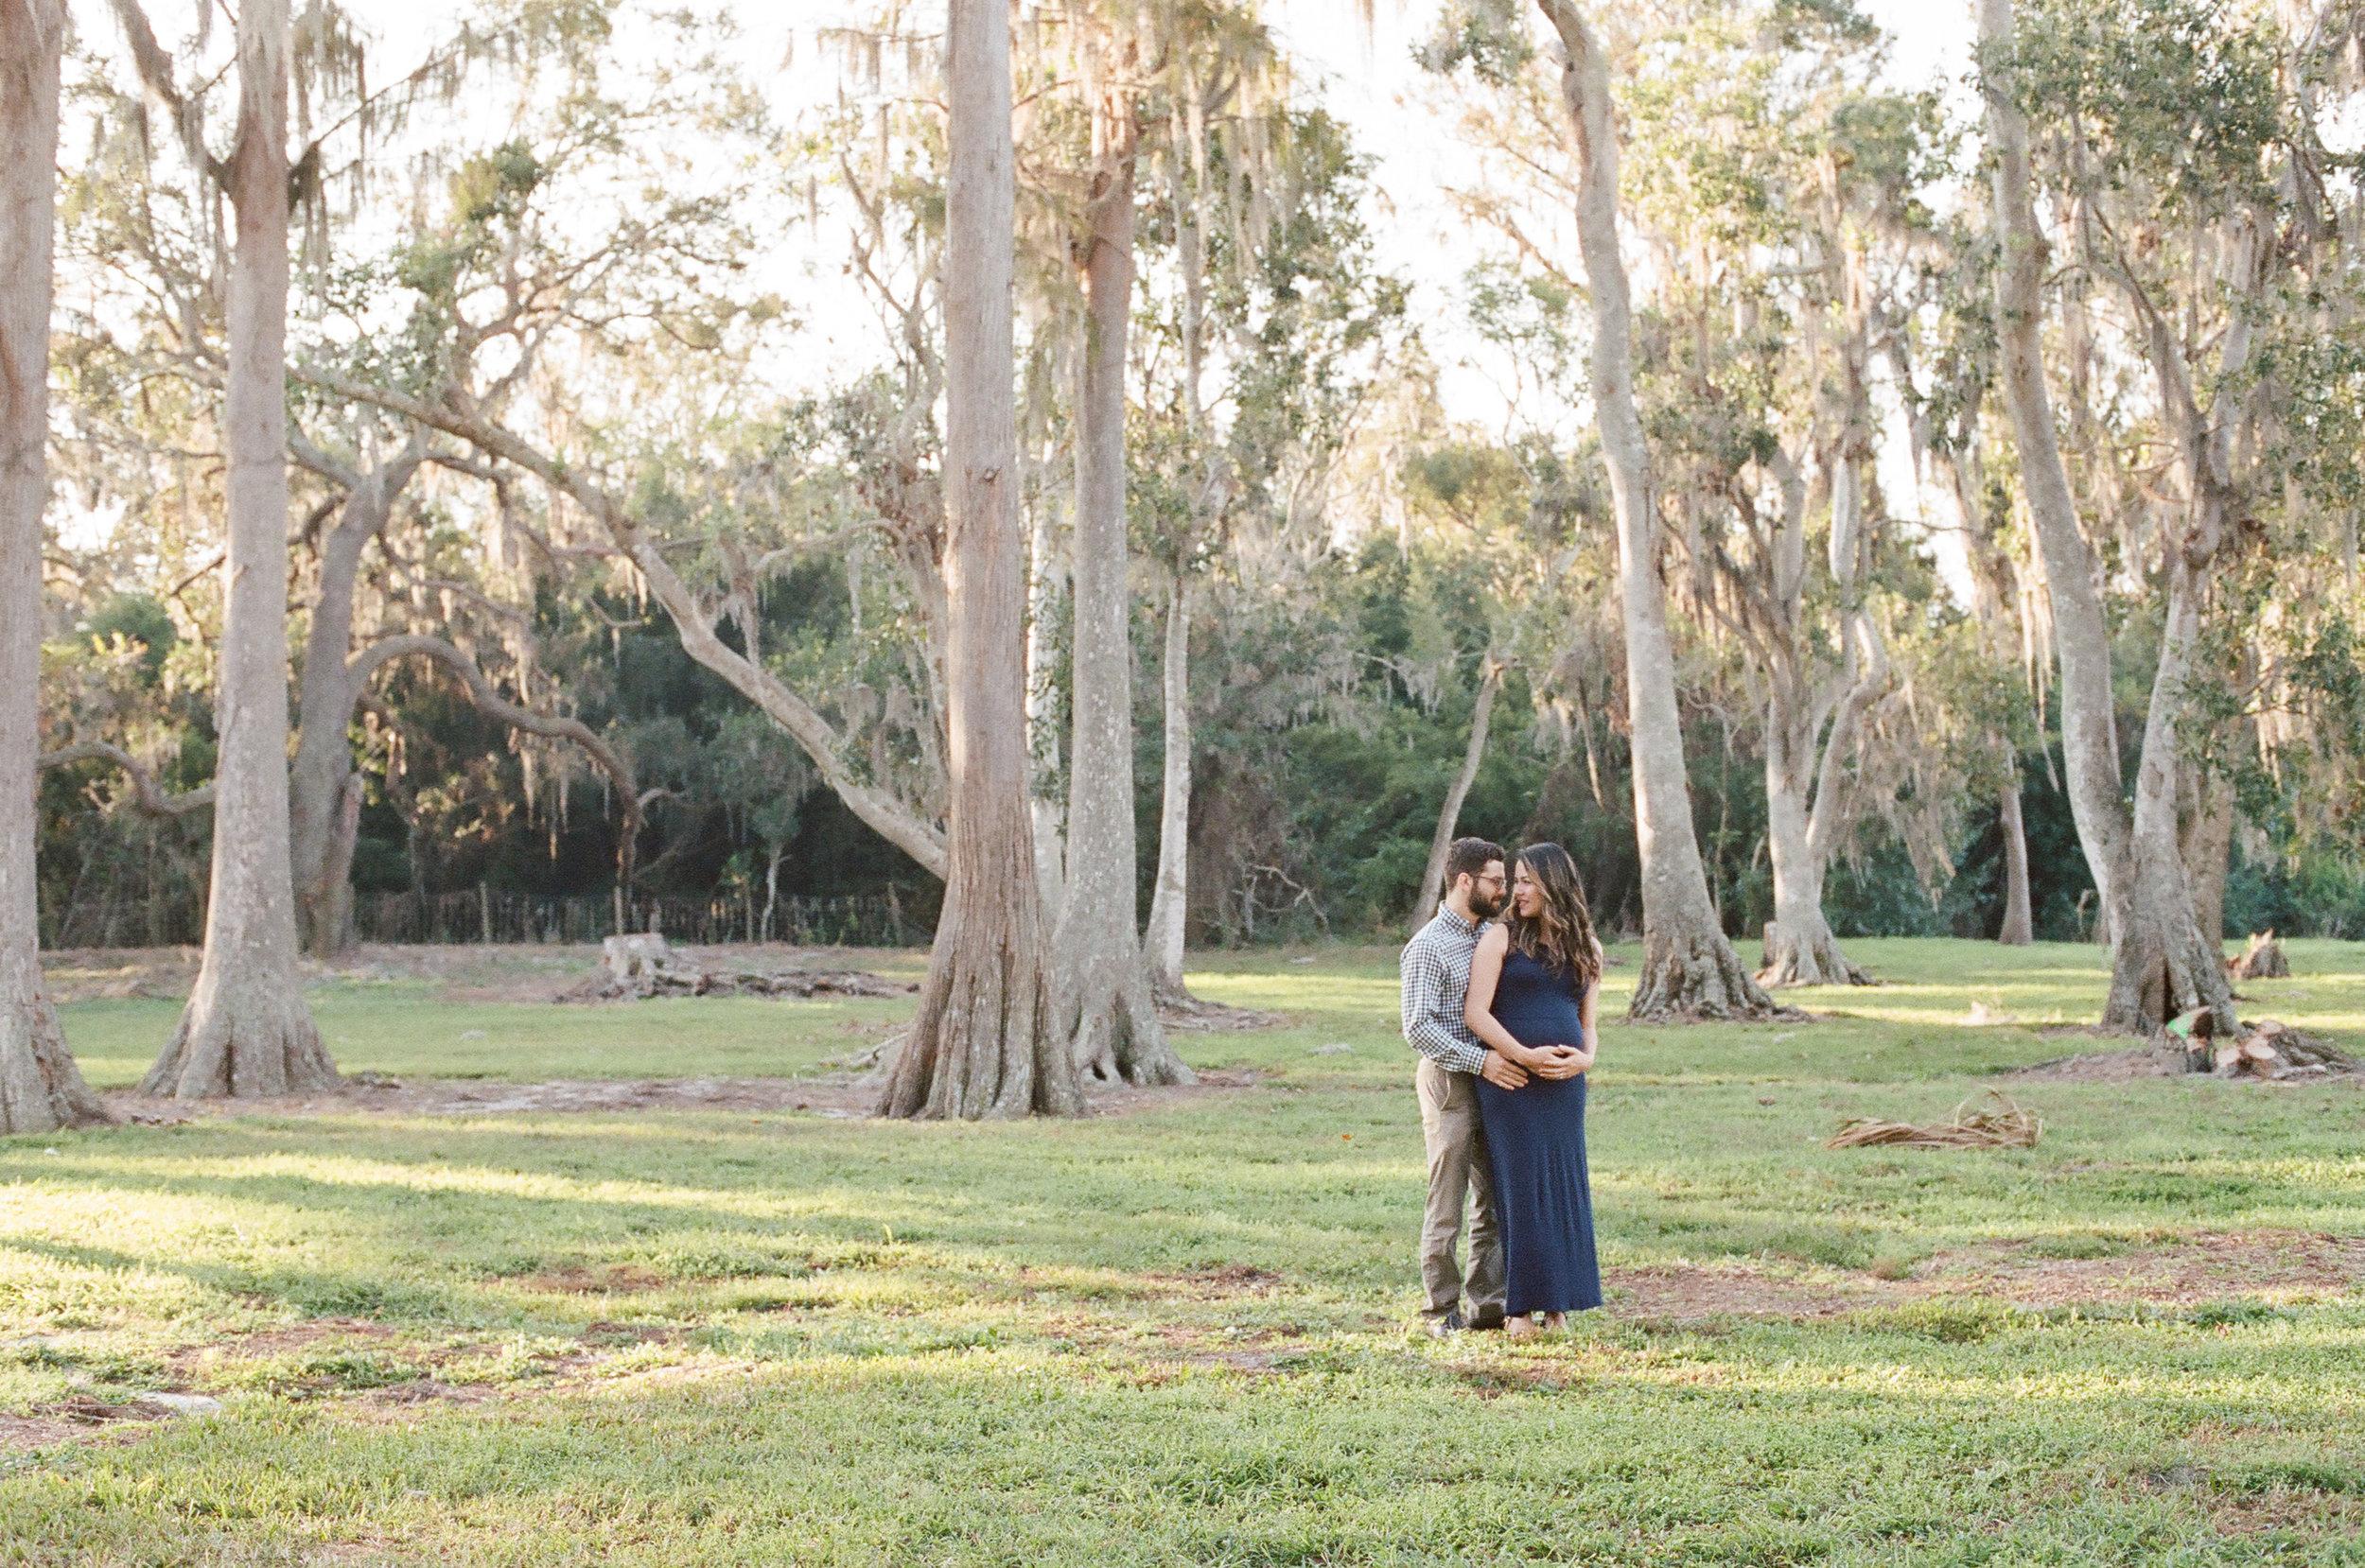 sauphia-germain-cypress-grove-estate-maternity.jpg